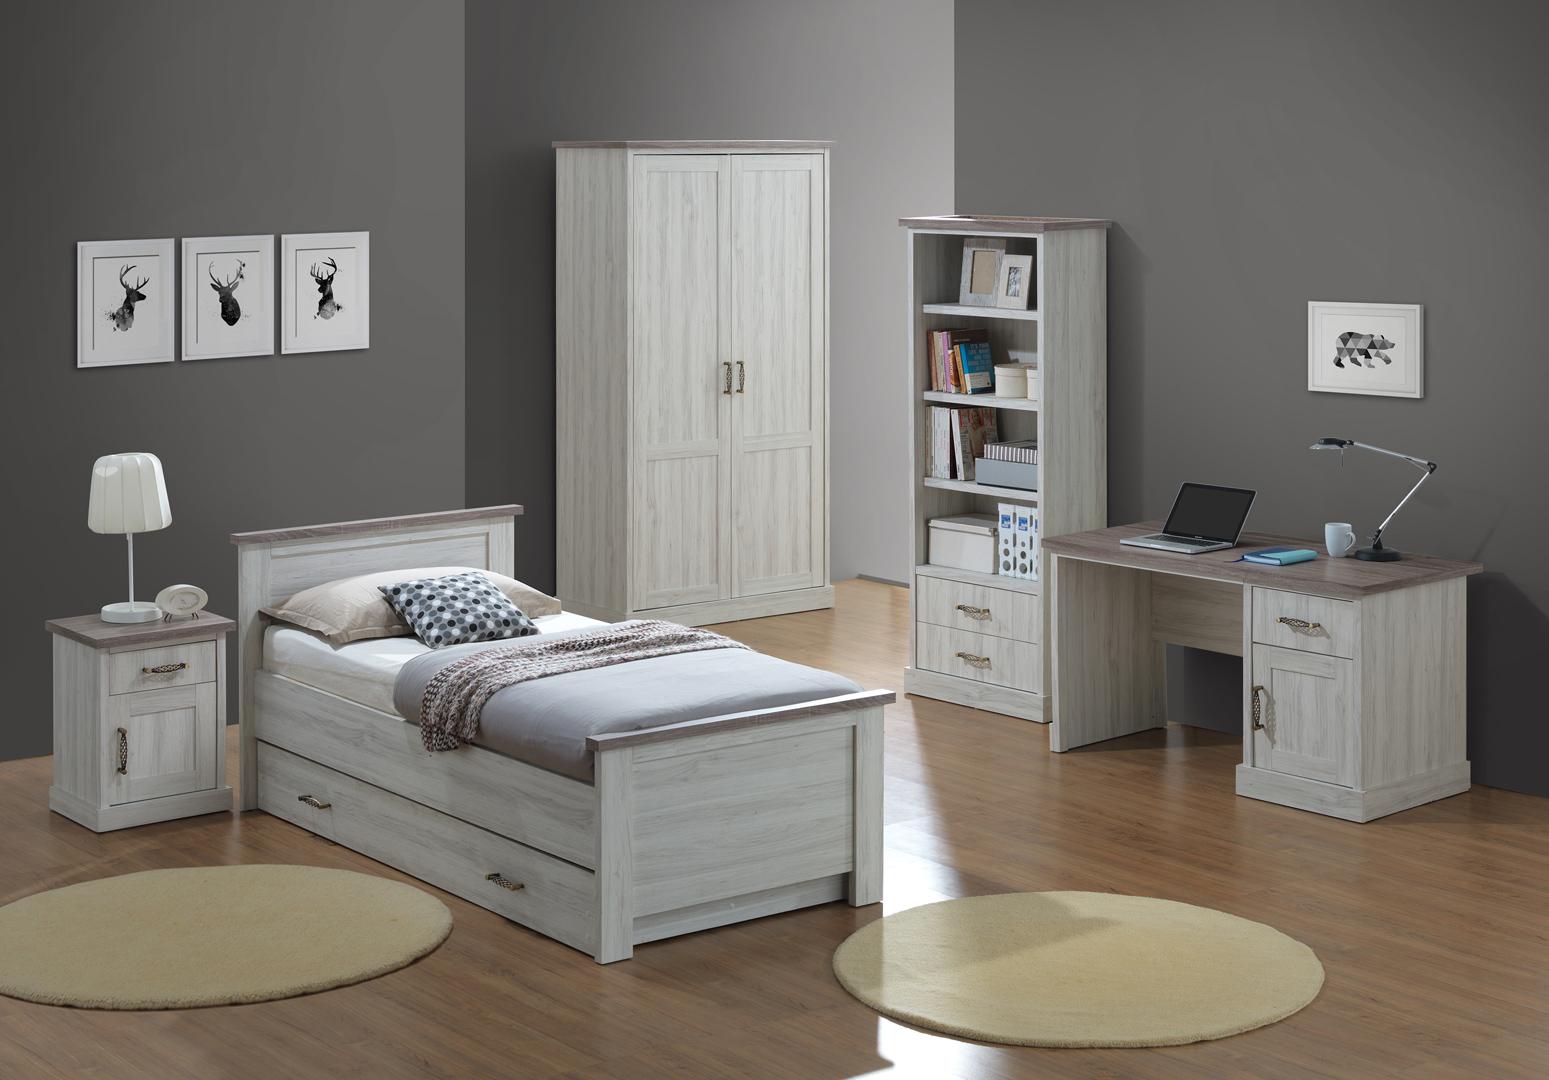 bureau contemporain ch ne clair marron solange matelpro. Black Bedroom Furniture Sets. Home Design Ideas